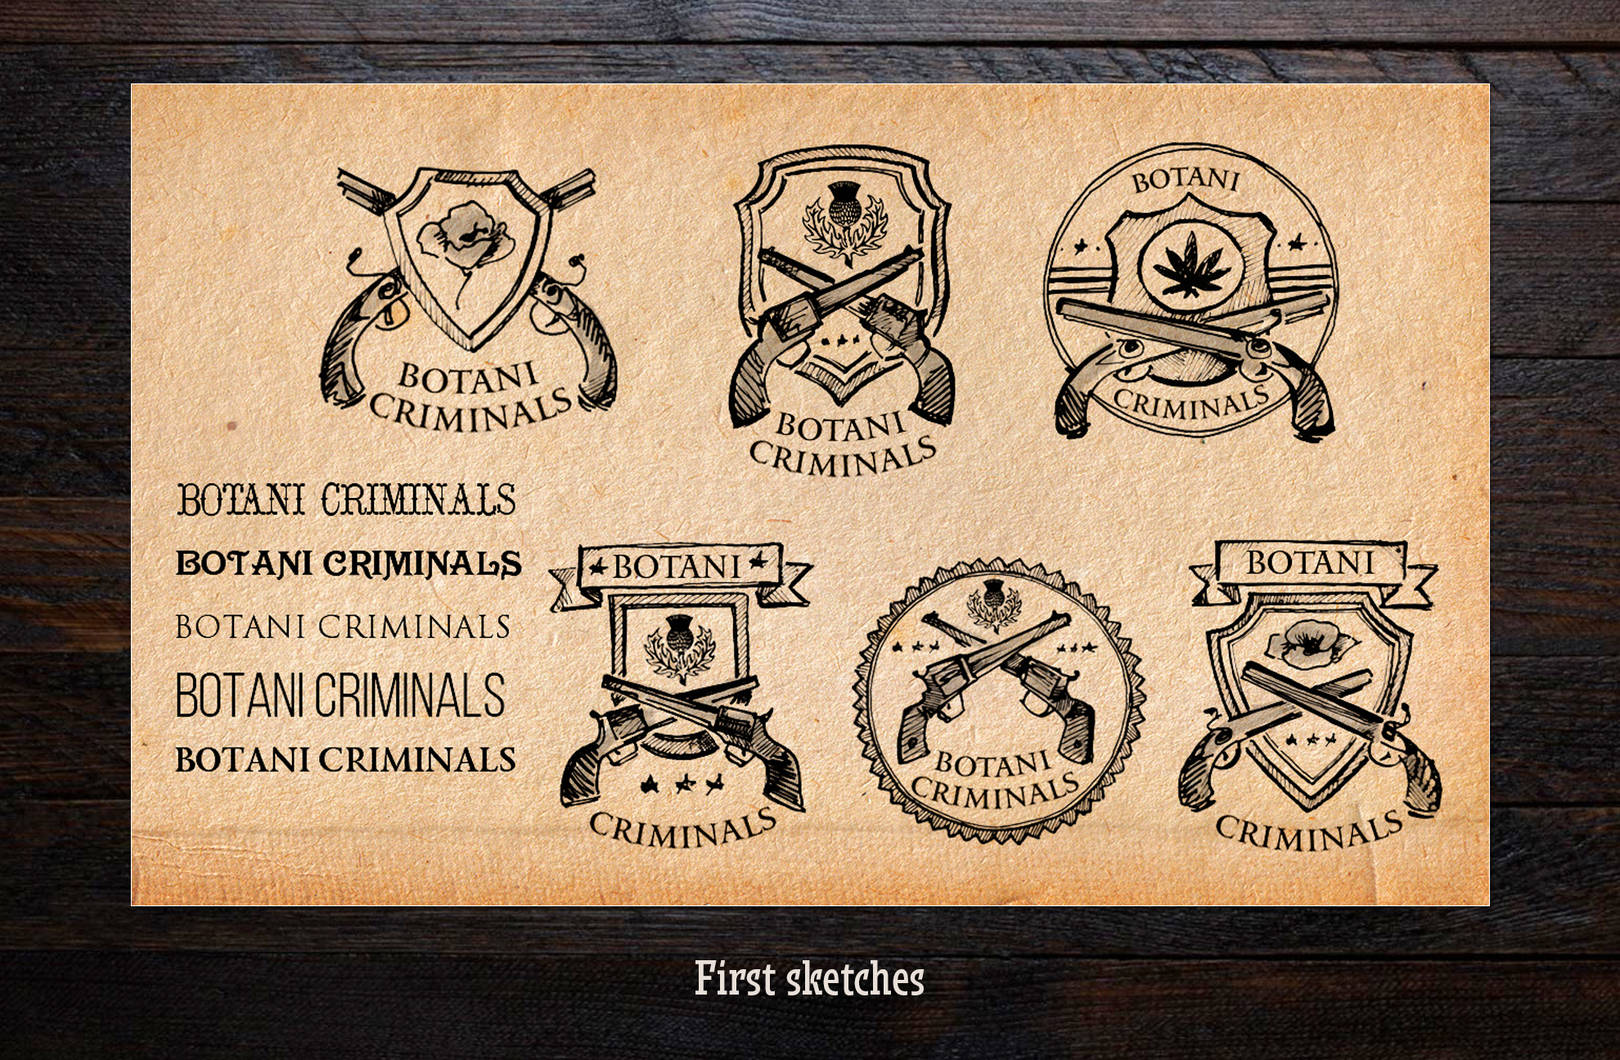 BotaniCriminals